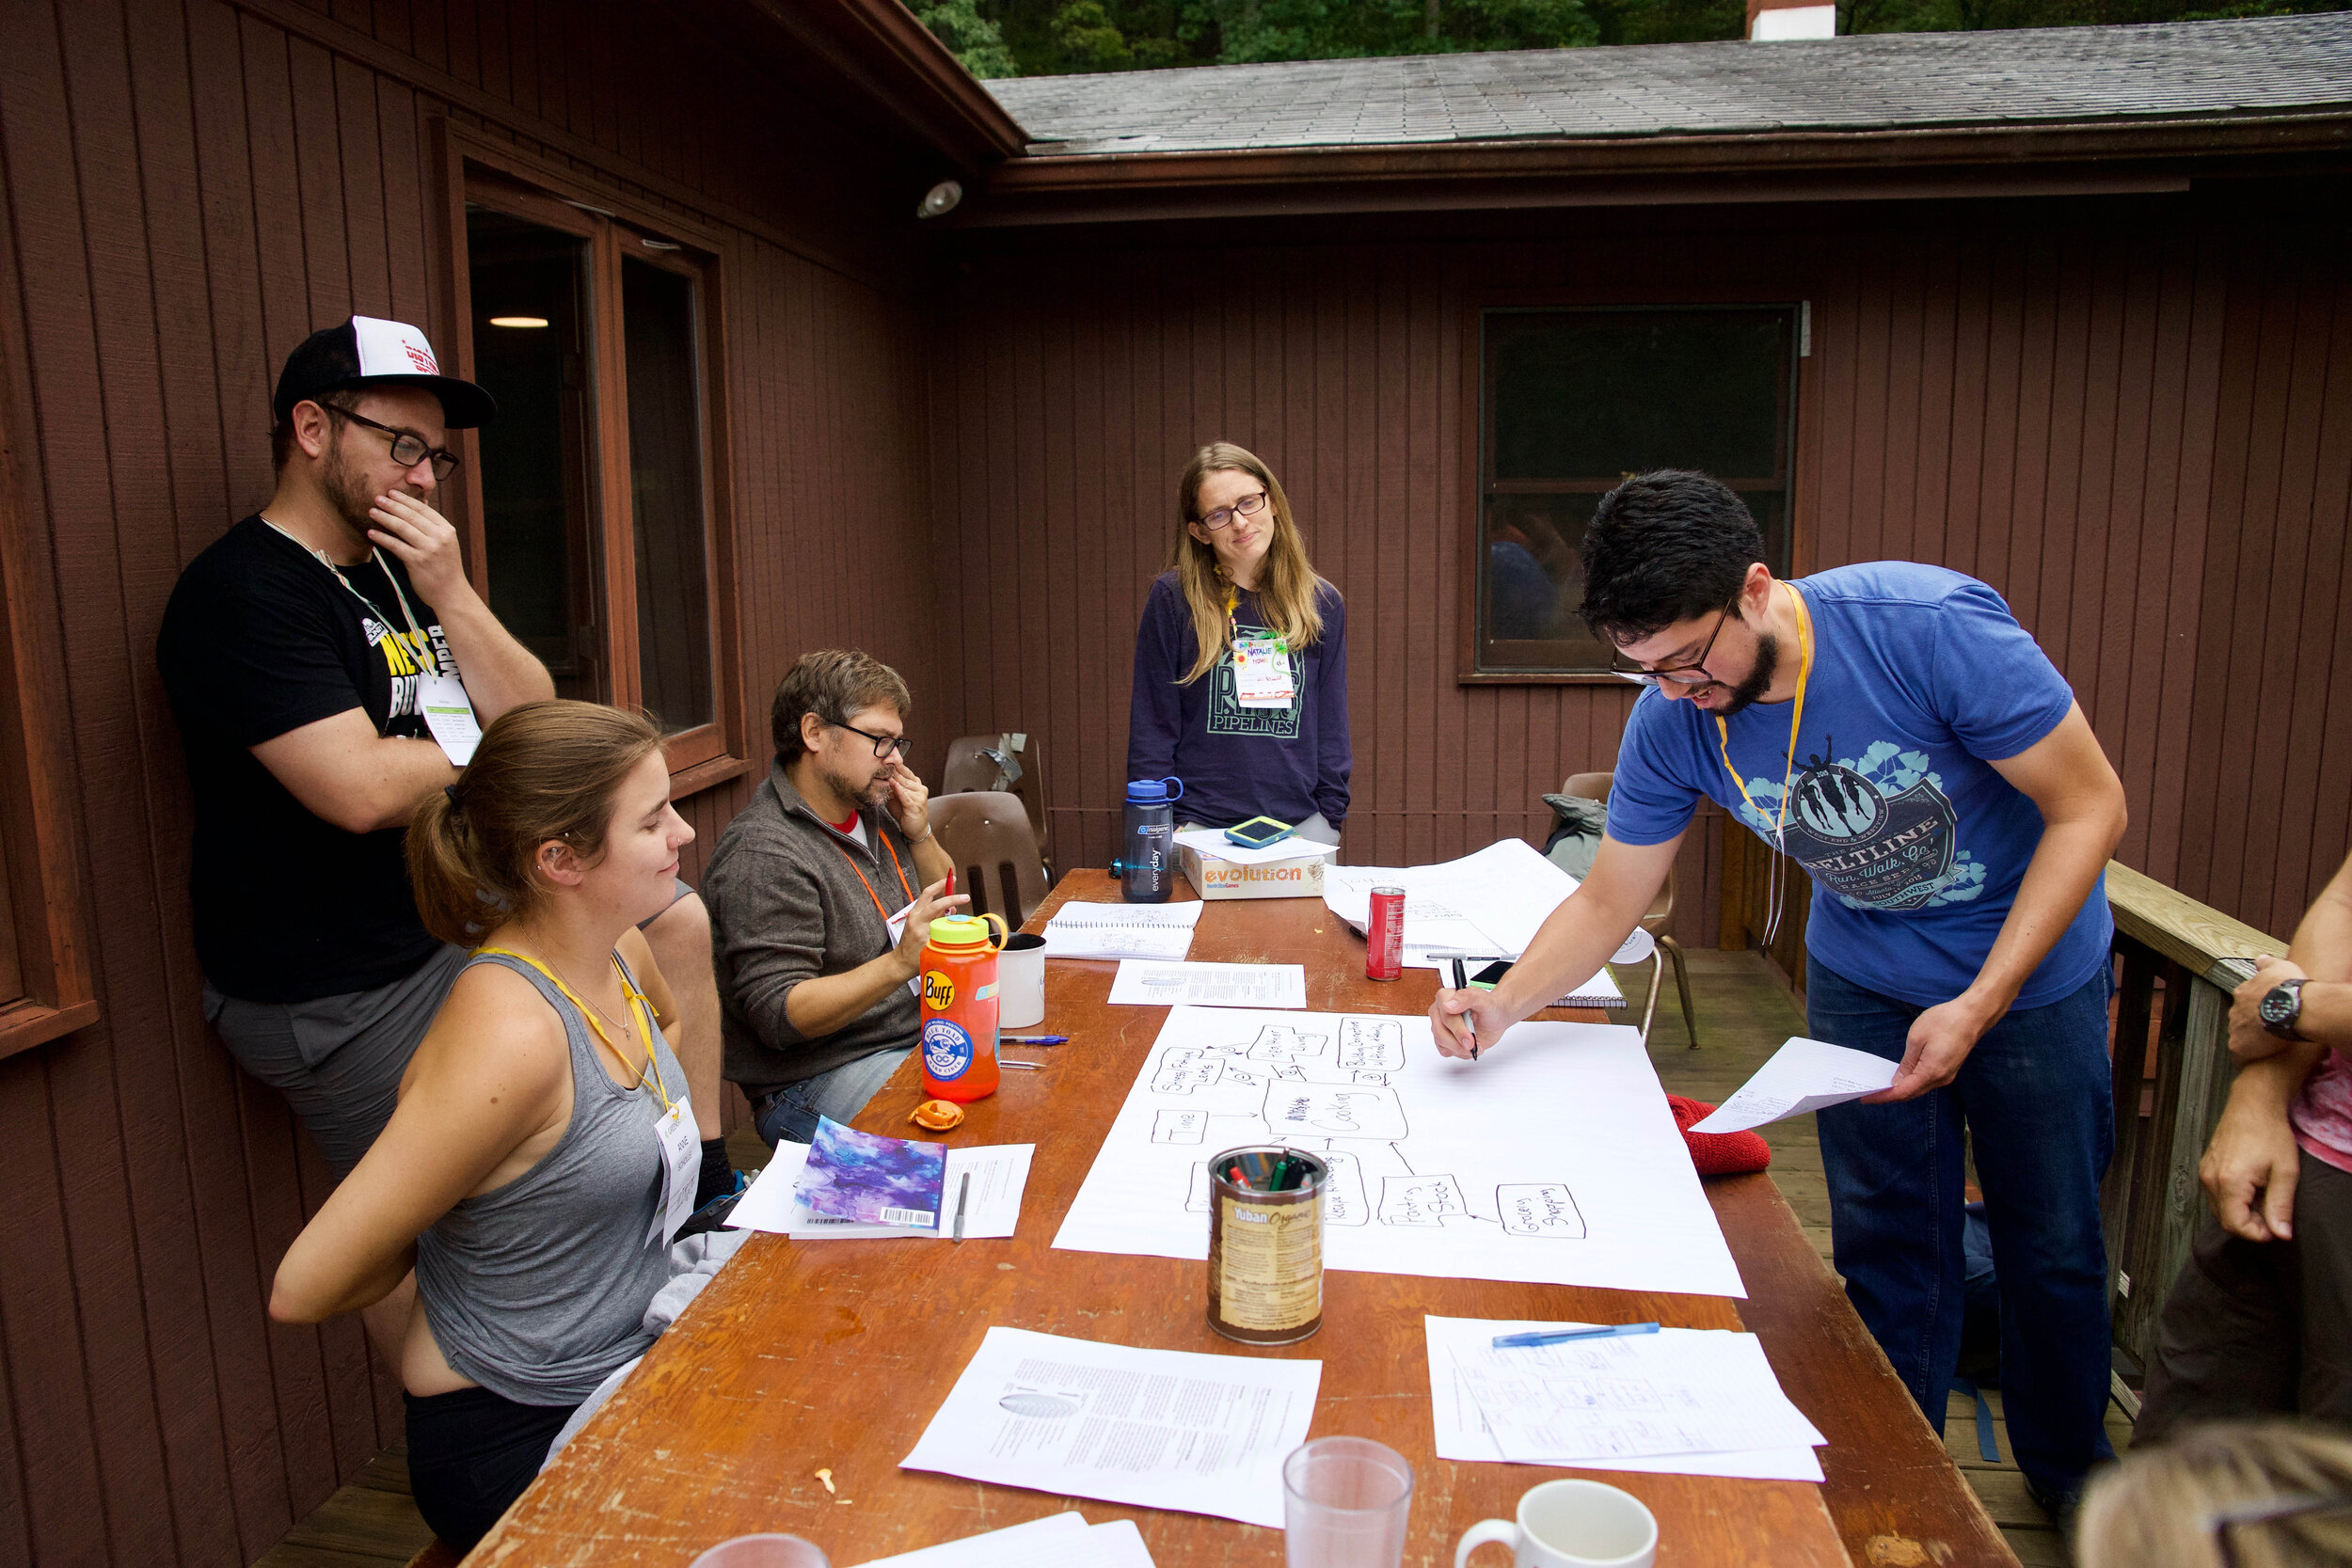 Leading an unconference workshop